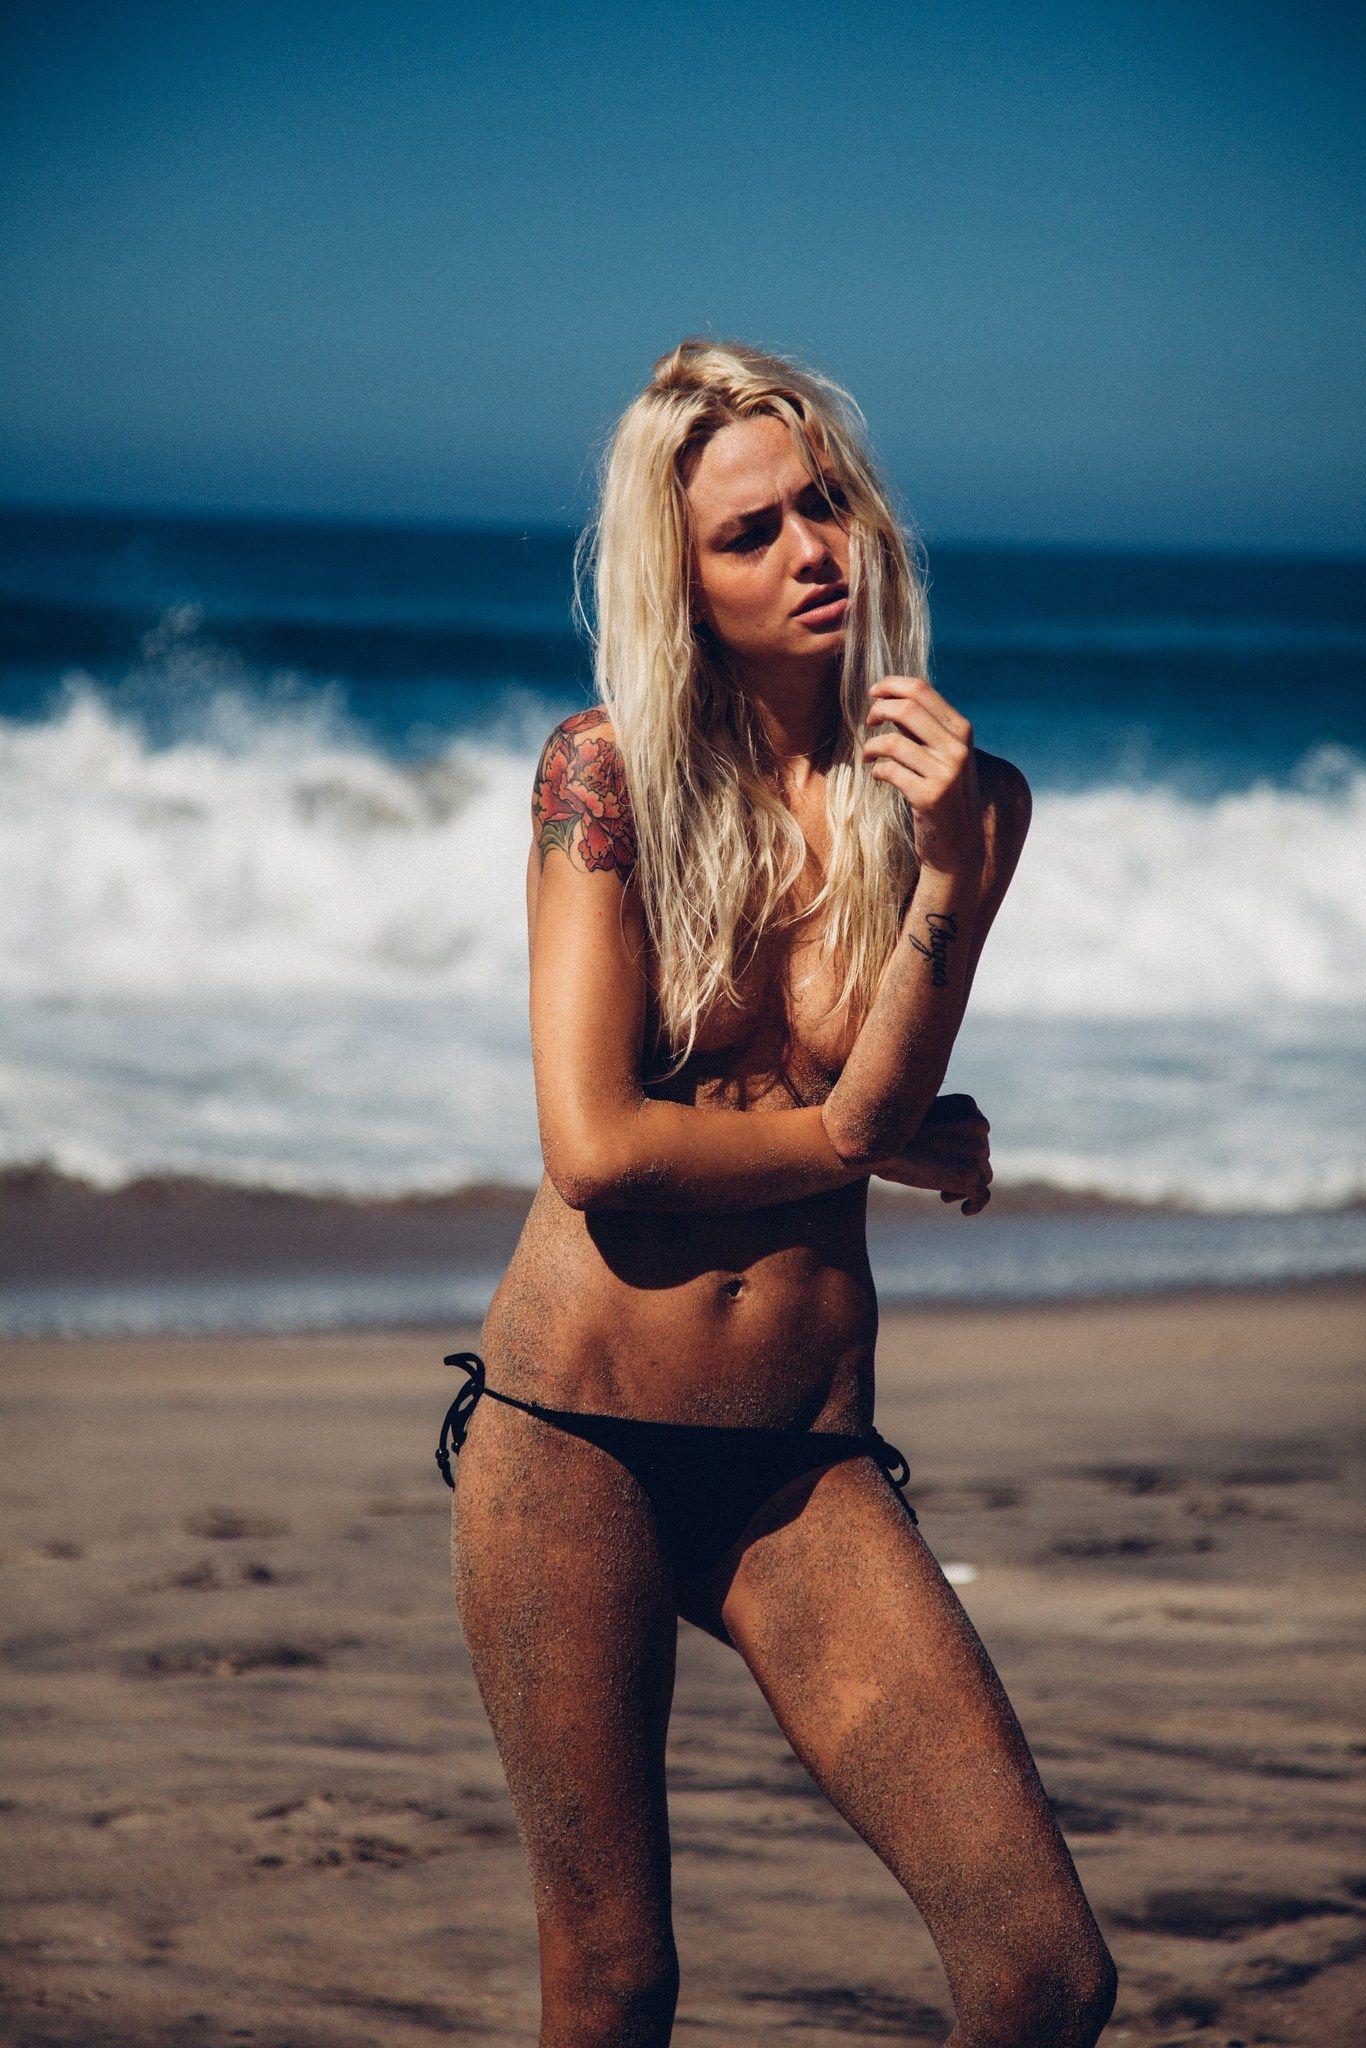 Bryden jenkins naked nudes (71 photos), Boobs Celebrity fotos